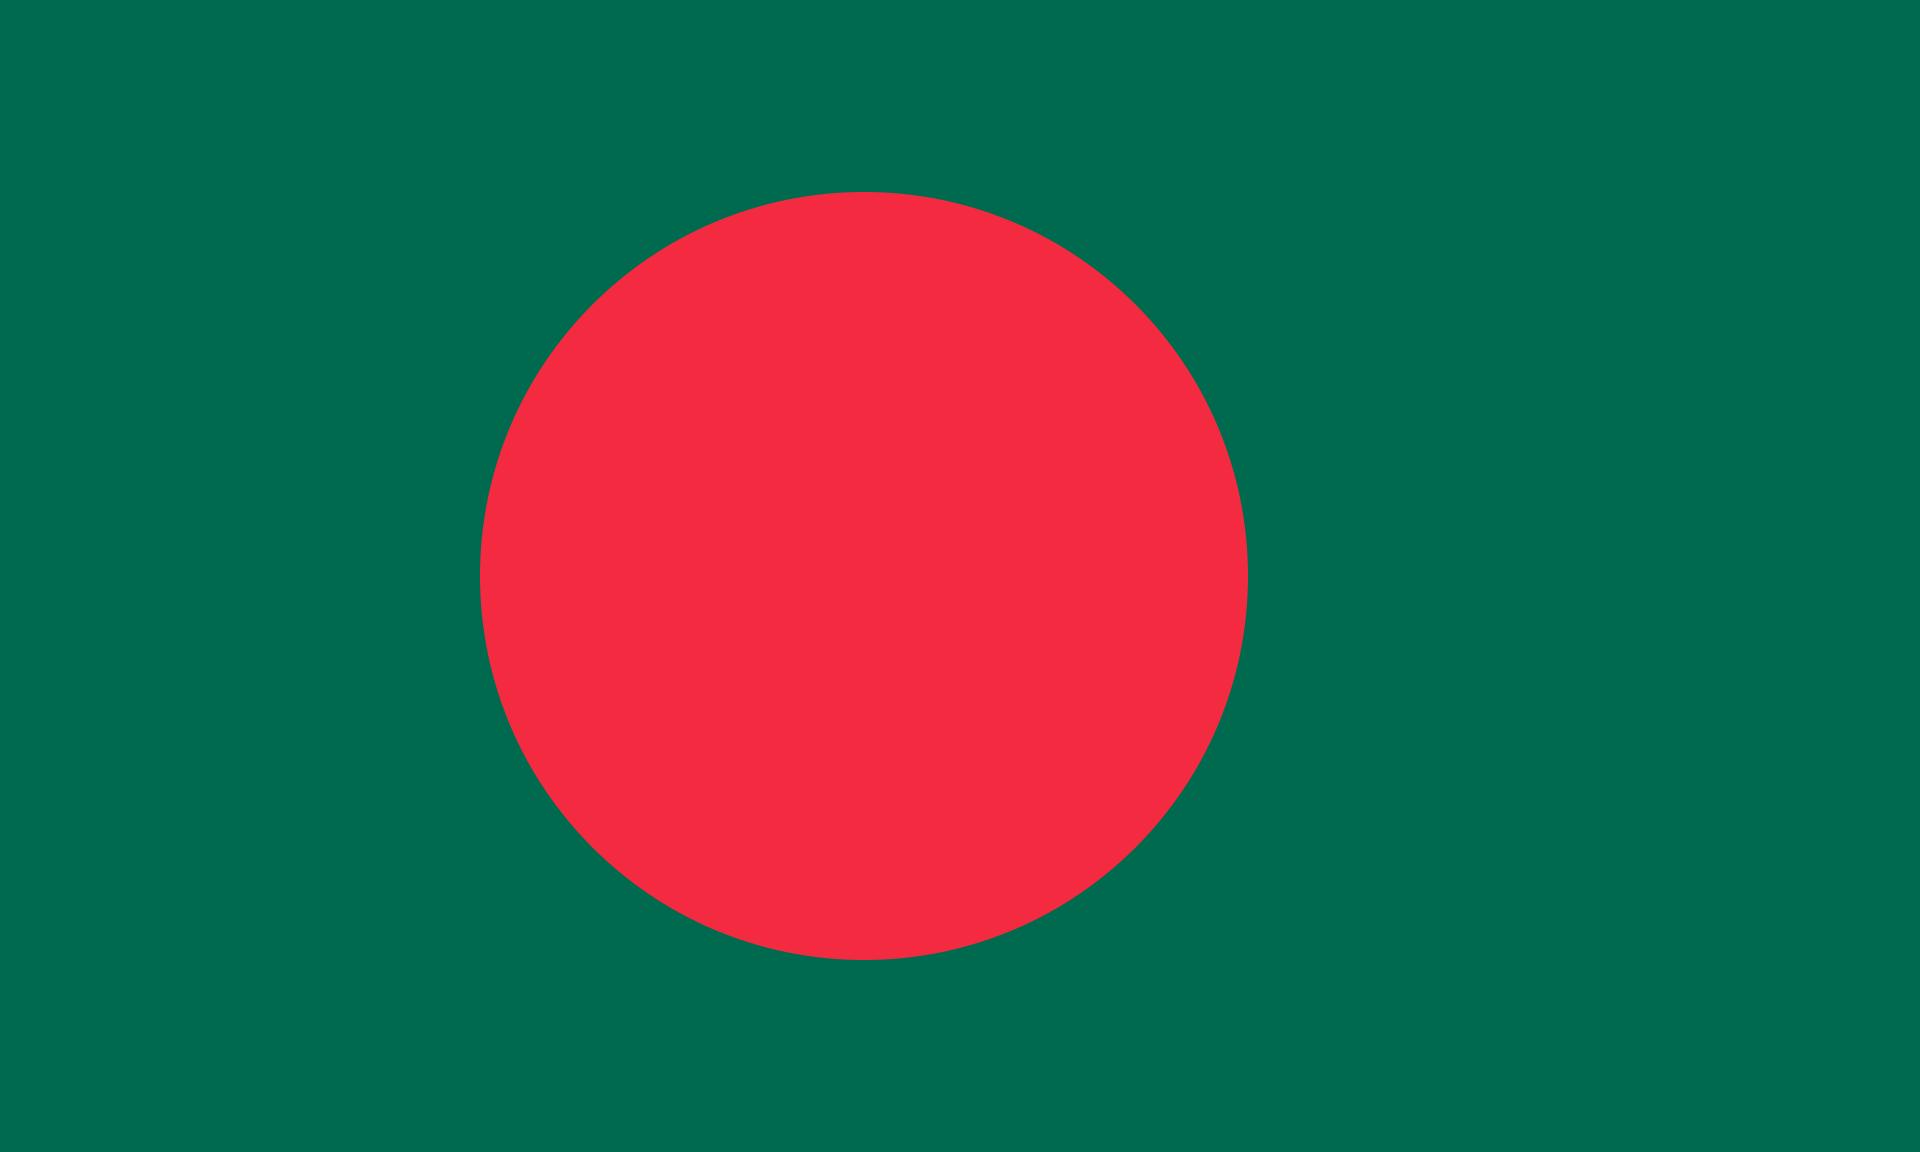 Traductores certificados bengalí